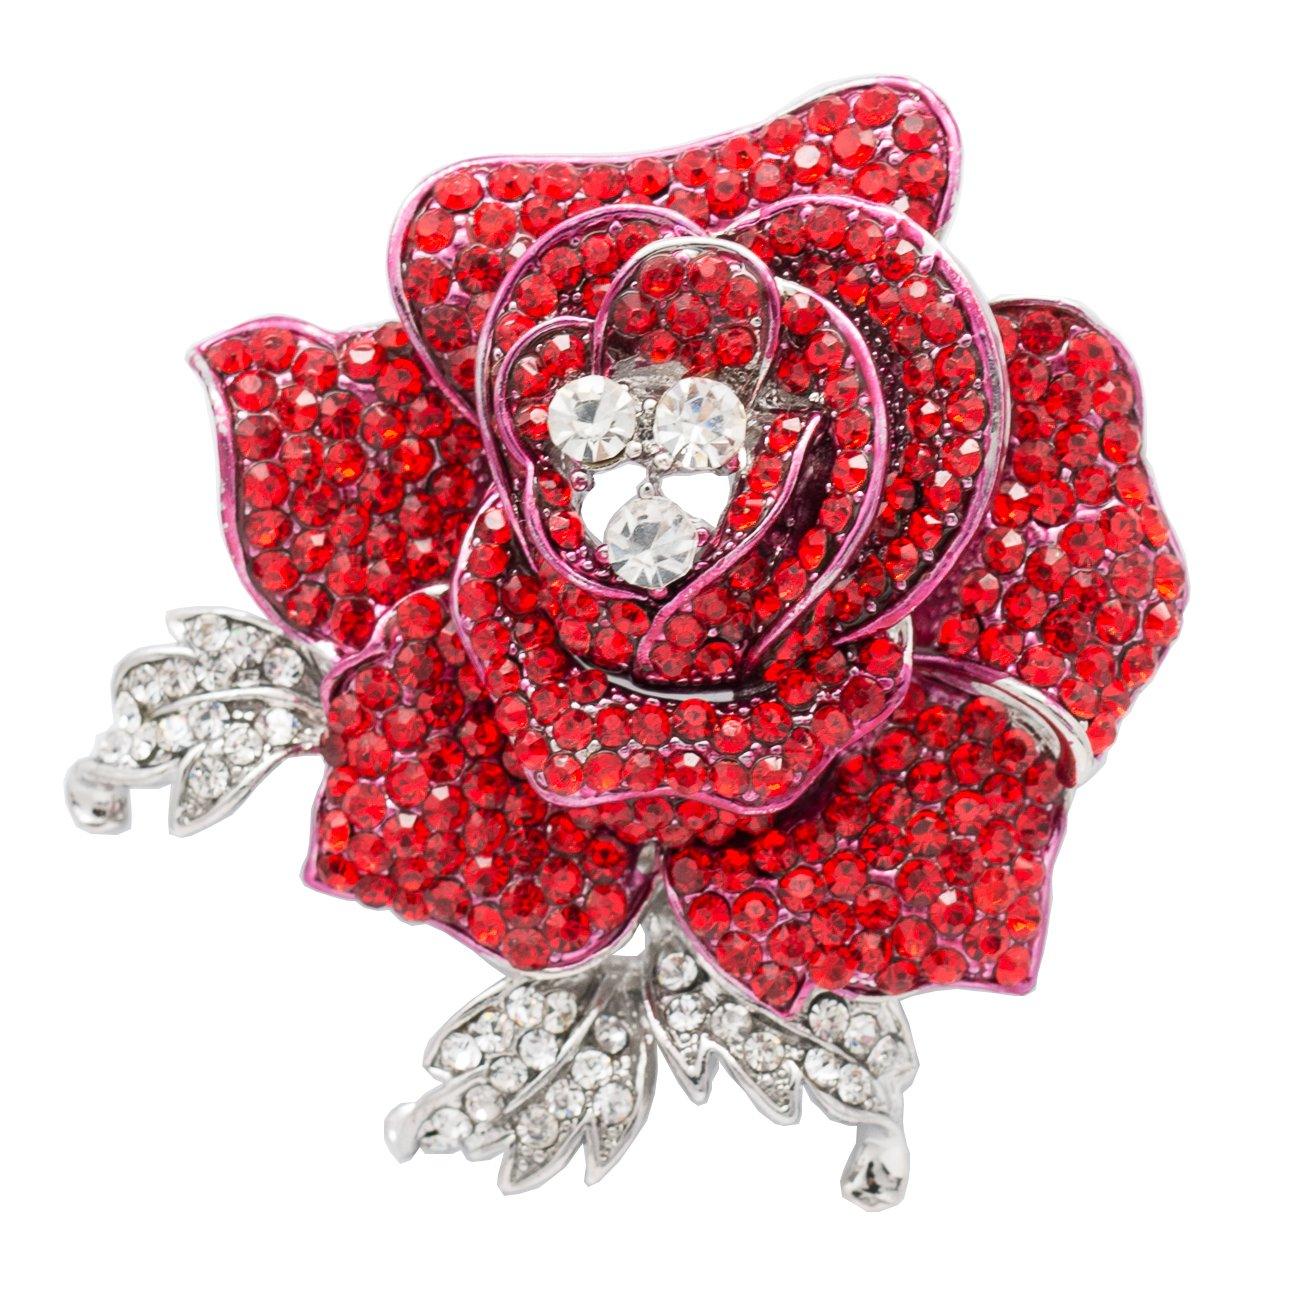 Rhinestone Crystals Wedding Bridal Rose Flower Brooch Pin Broach for Women Jewelry (Red)